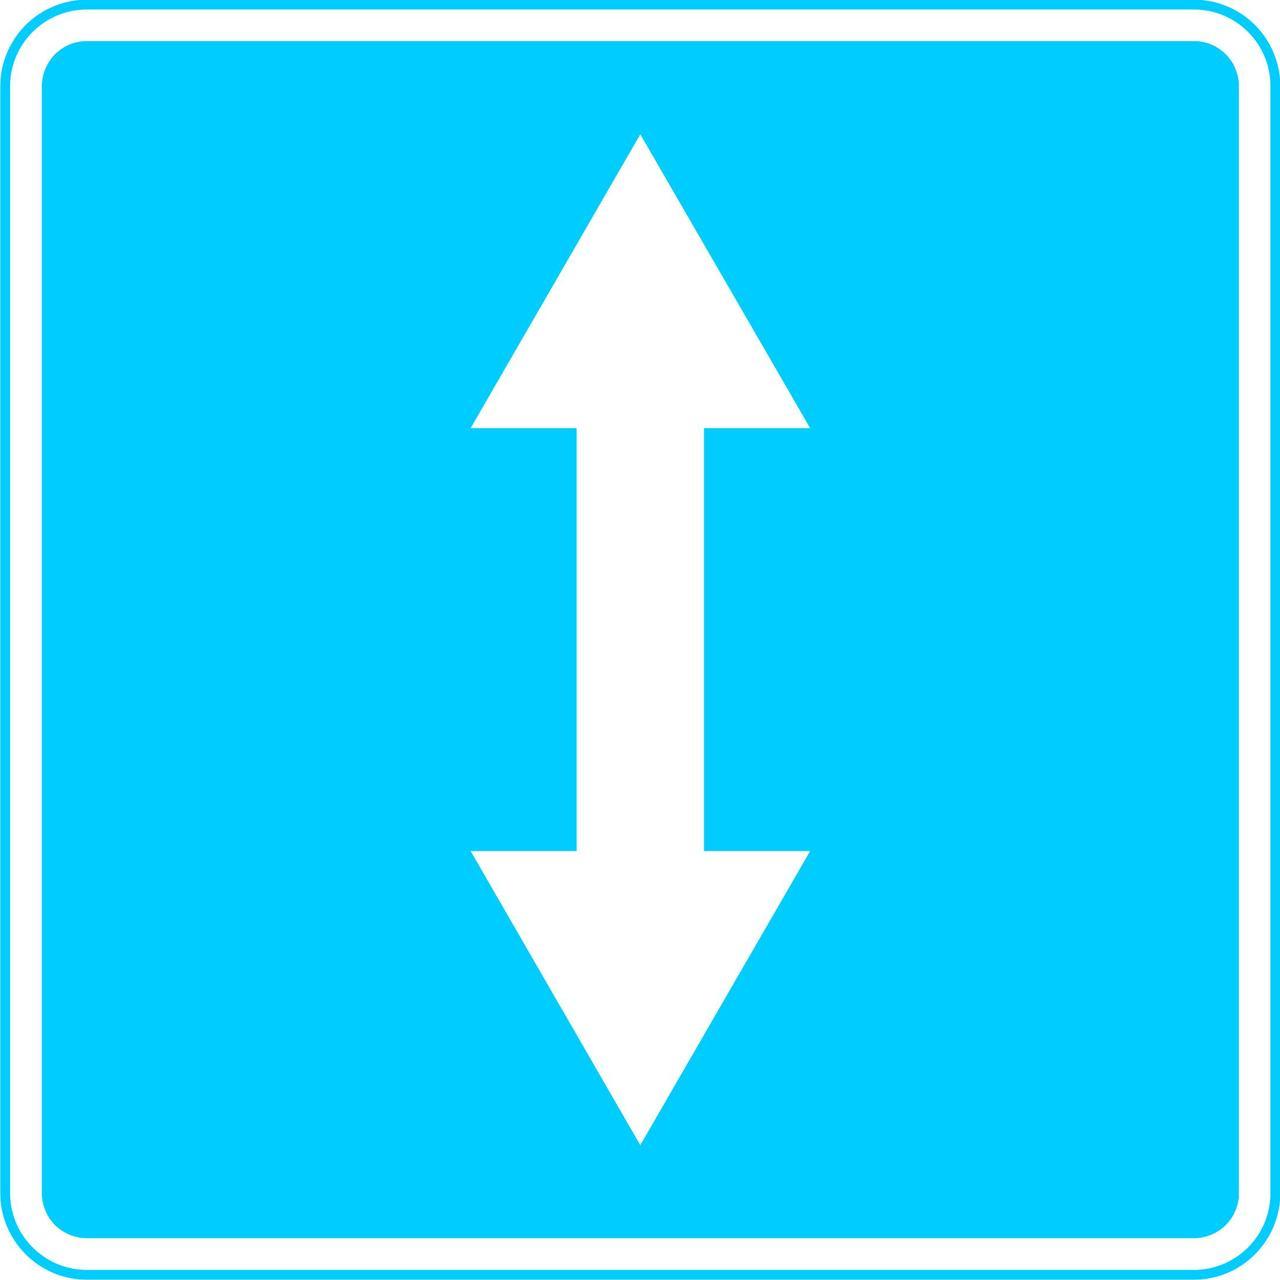 Знак 5.35 Кері қозғалыс/Реверсивное движение